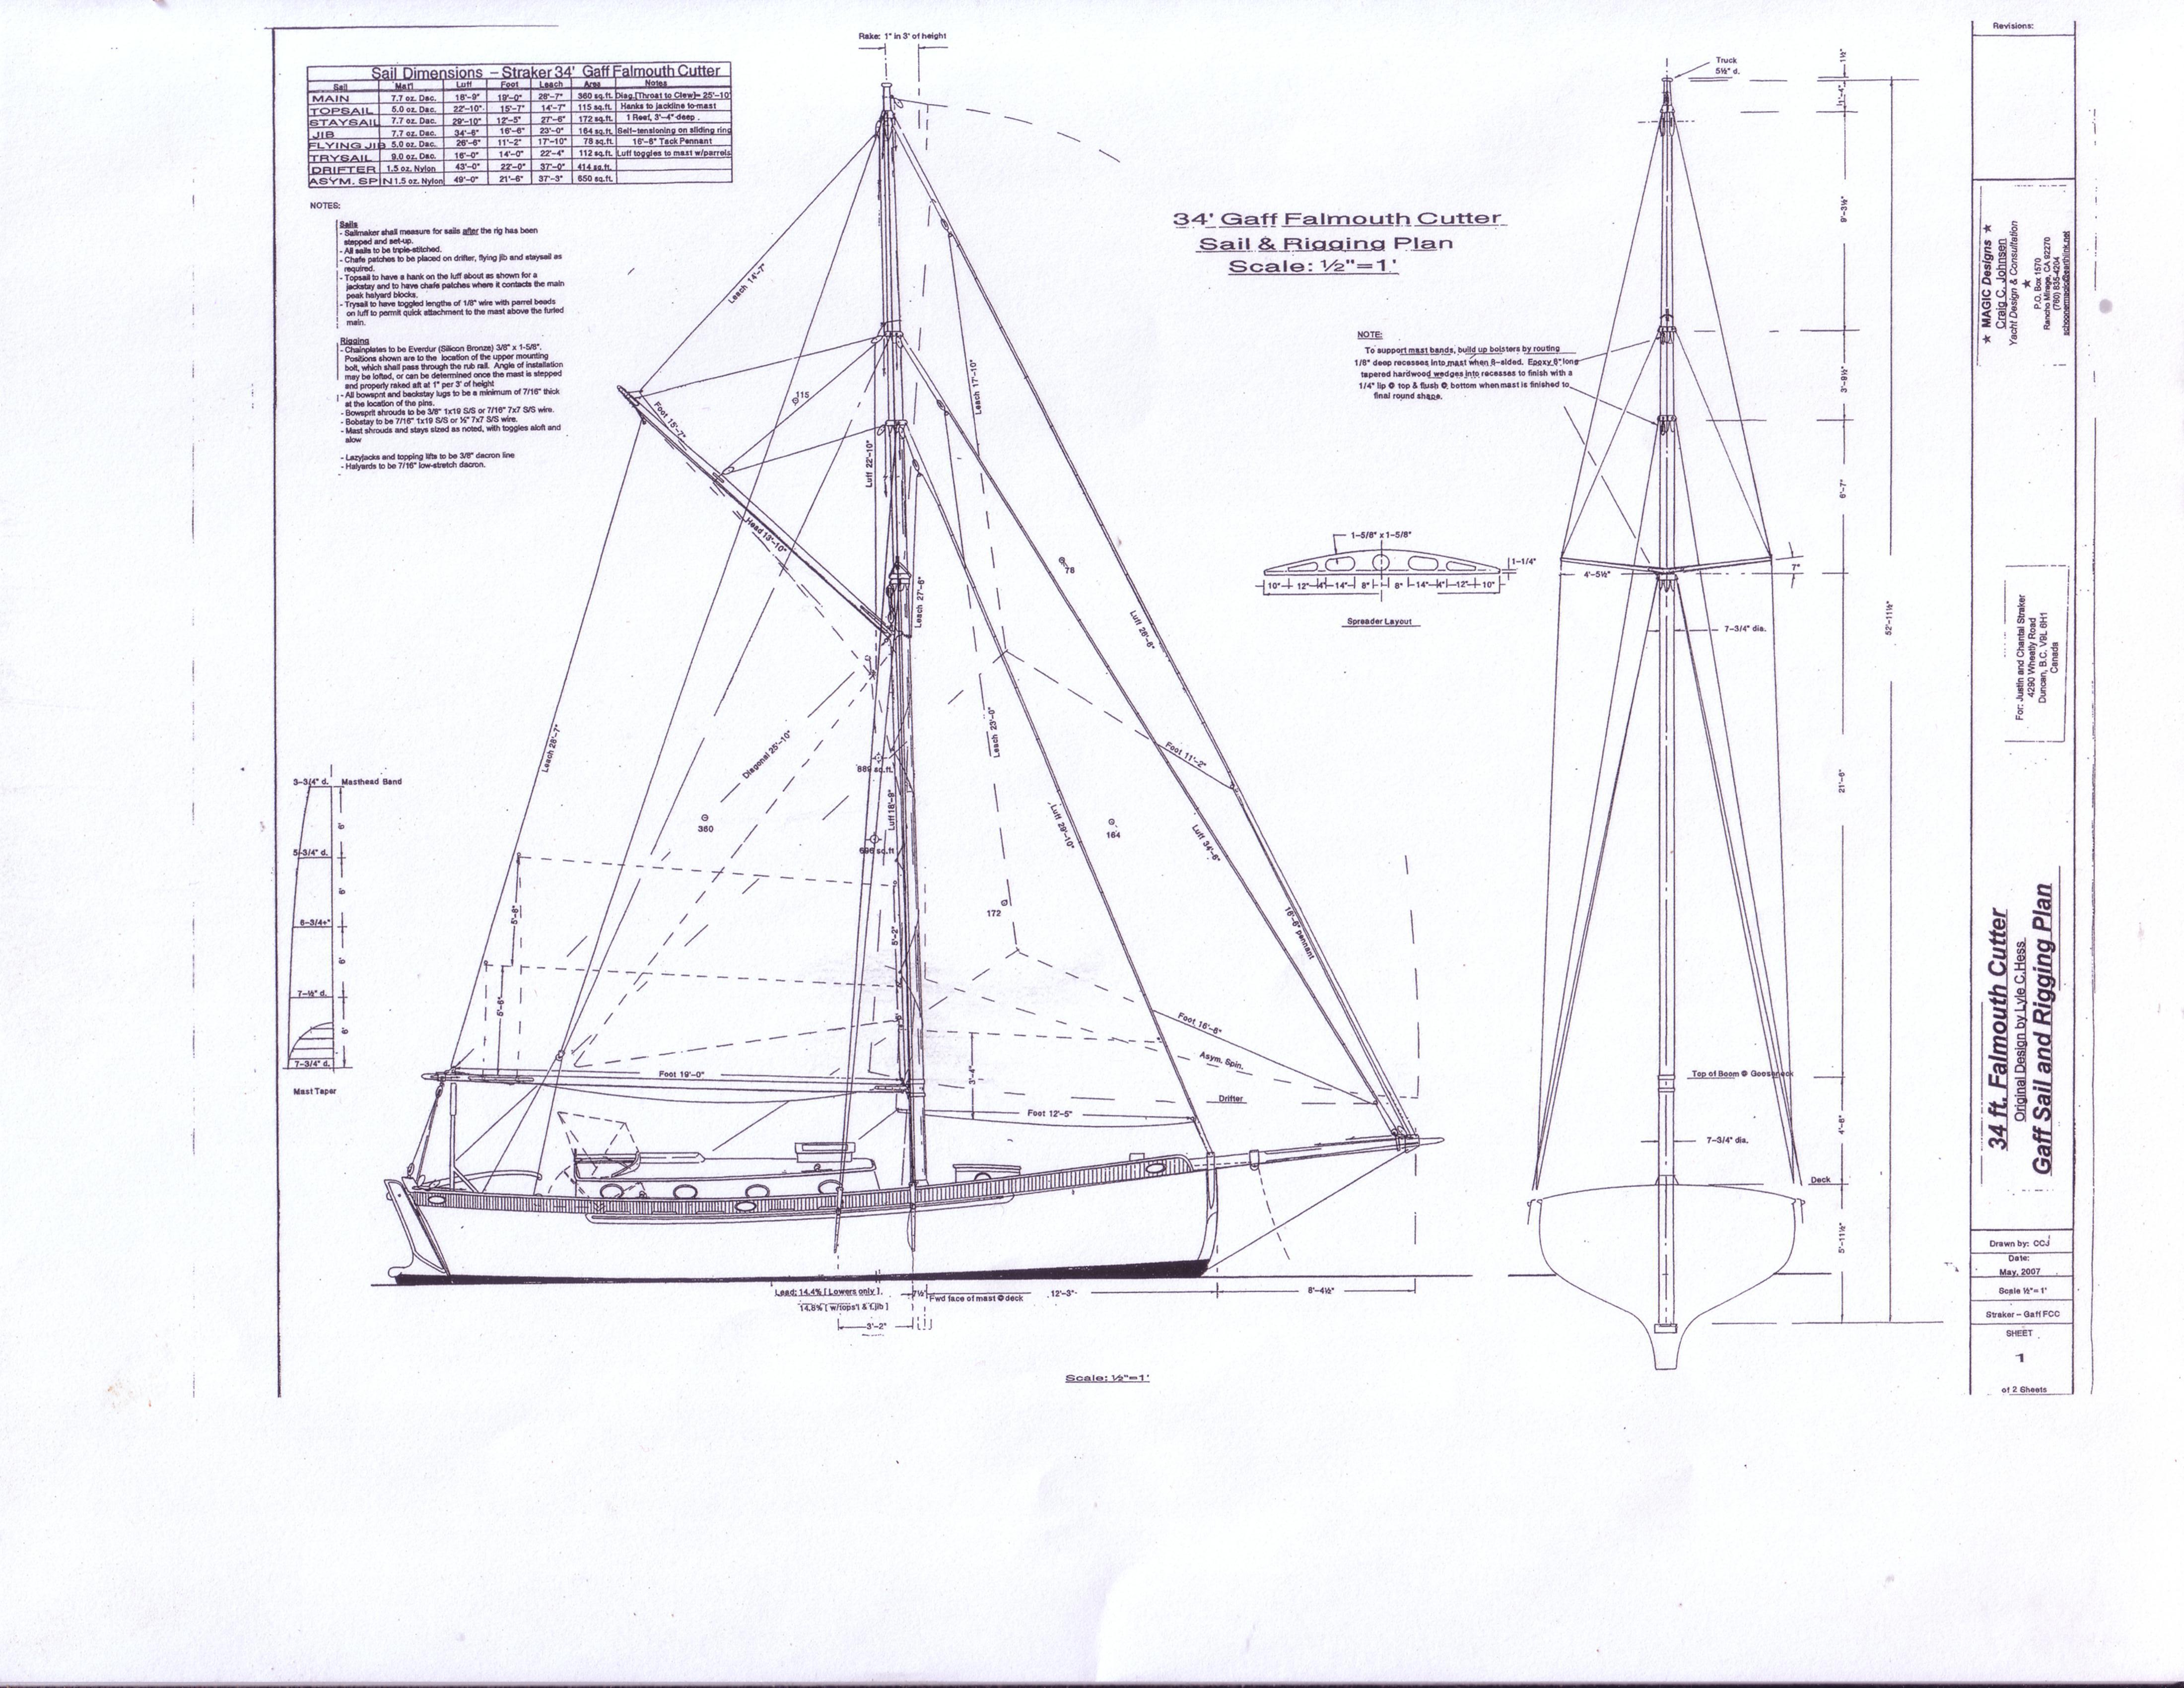 Gaff Sail and Rigging Plan